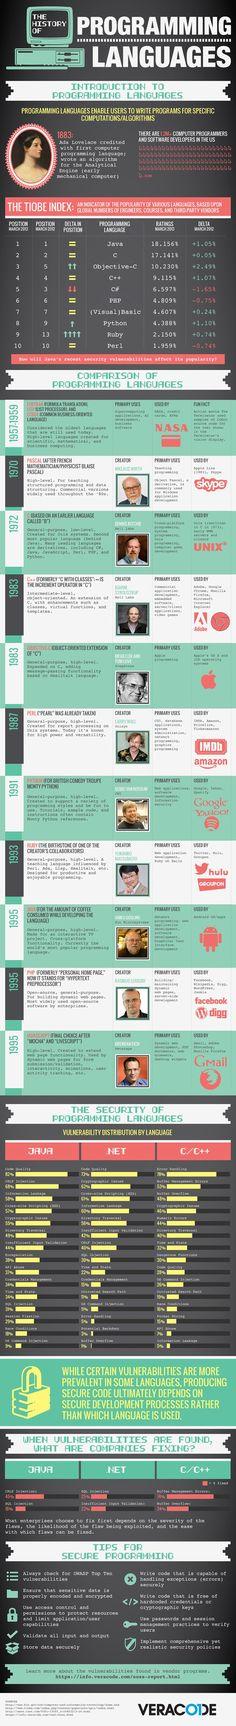 History of Computer Programming Languages